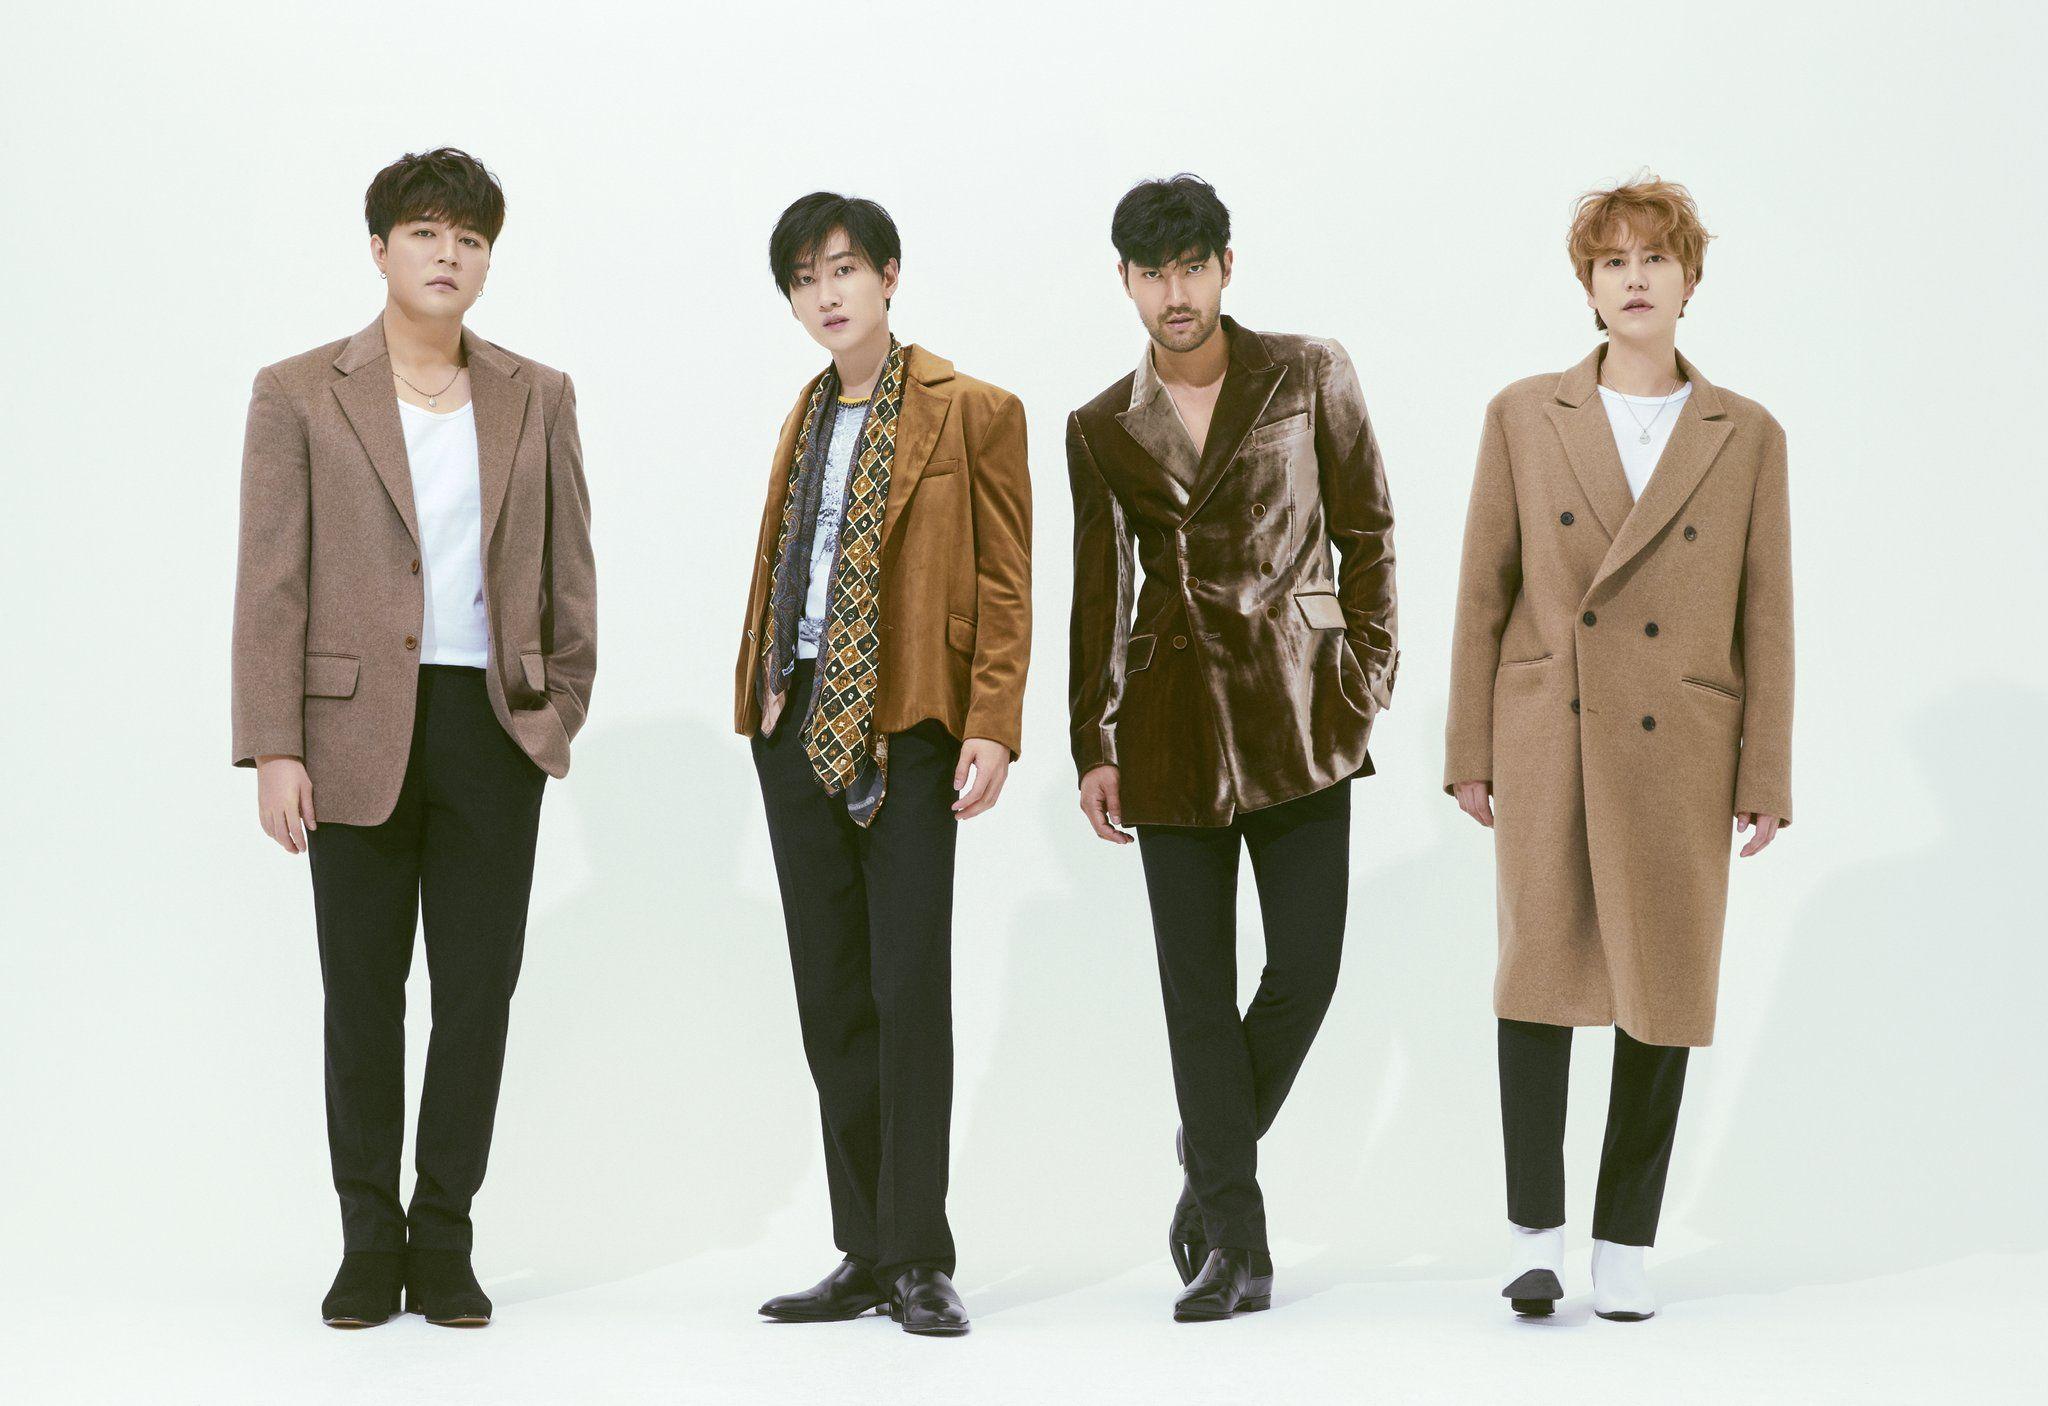 Super Junior Timeless Teaser Photos Hd Hr In 2020 Super Junior Eunhyuk Super Junior Members